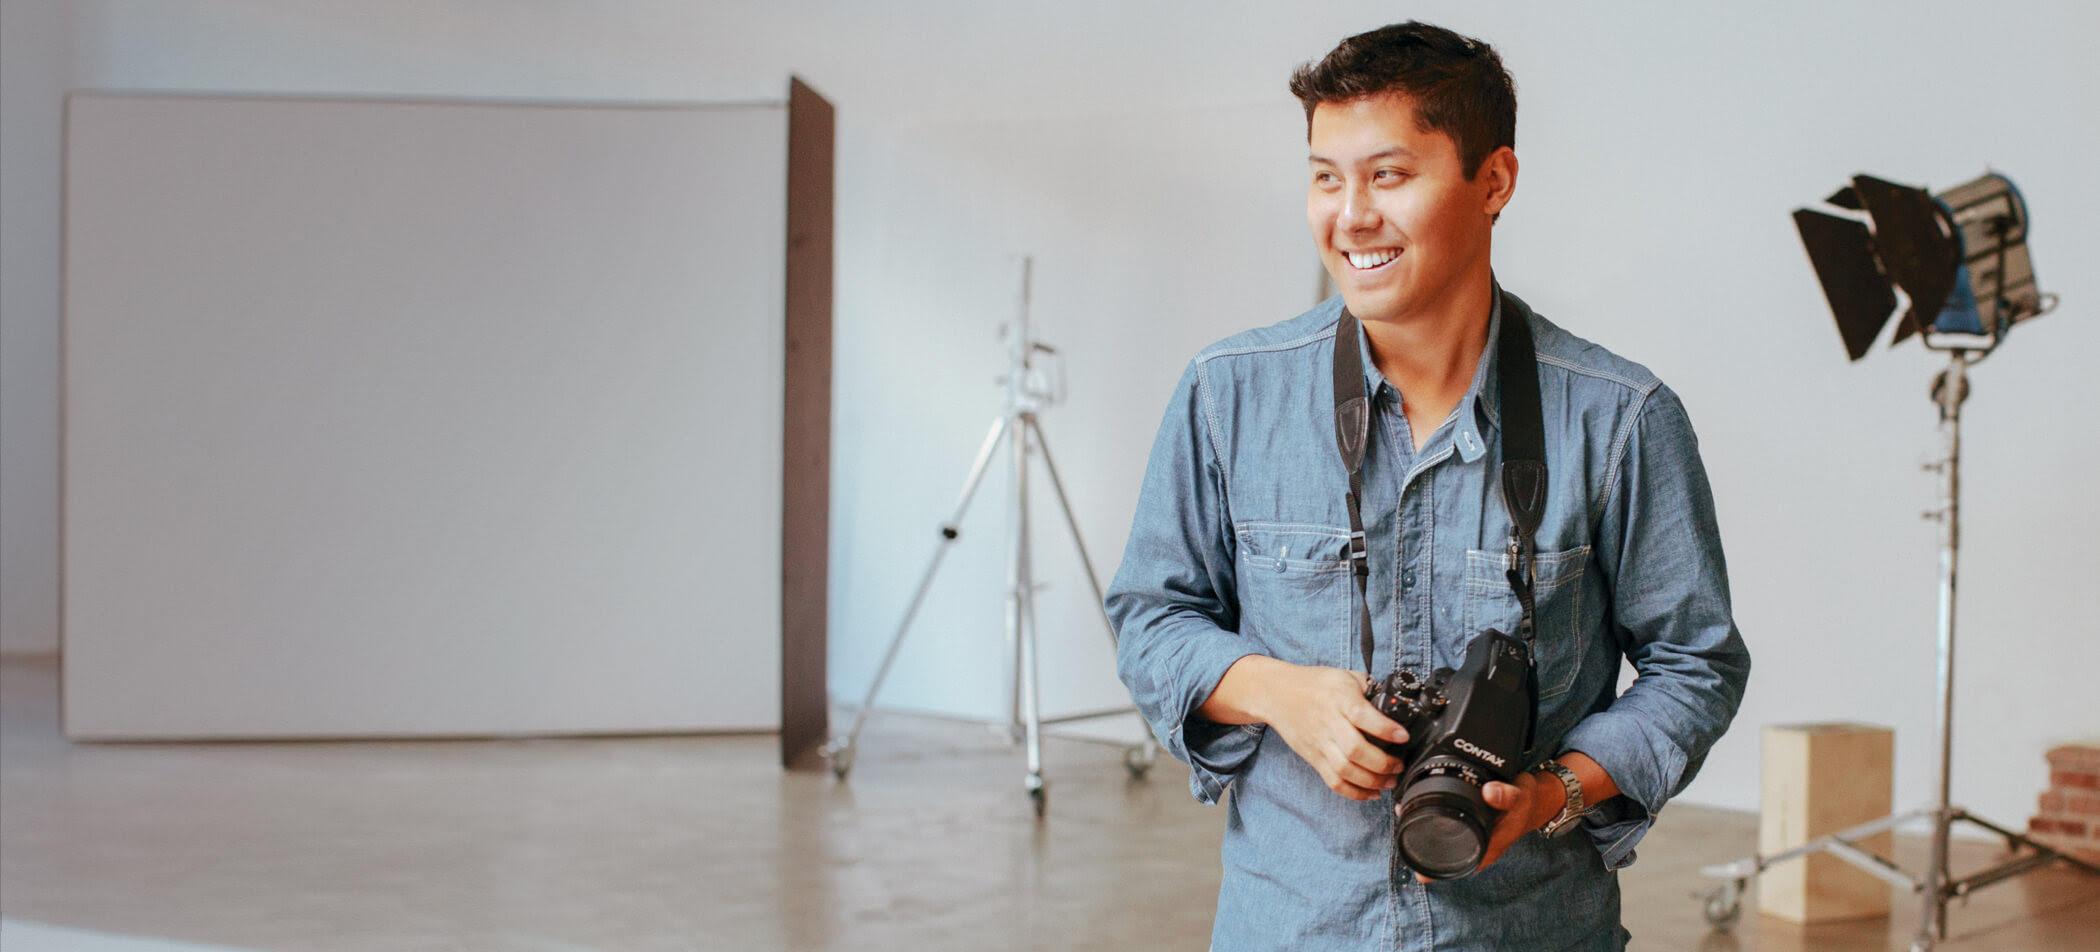 Profile image of USD alumni Justin Chung